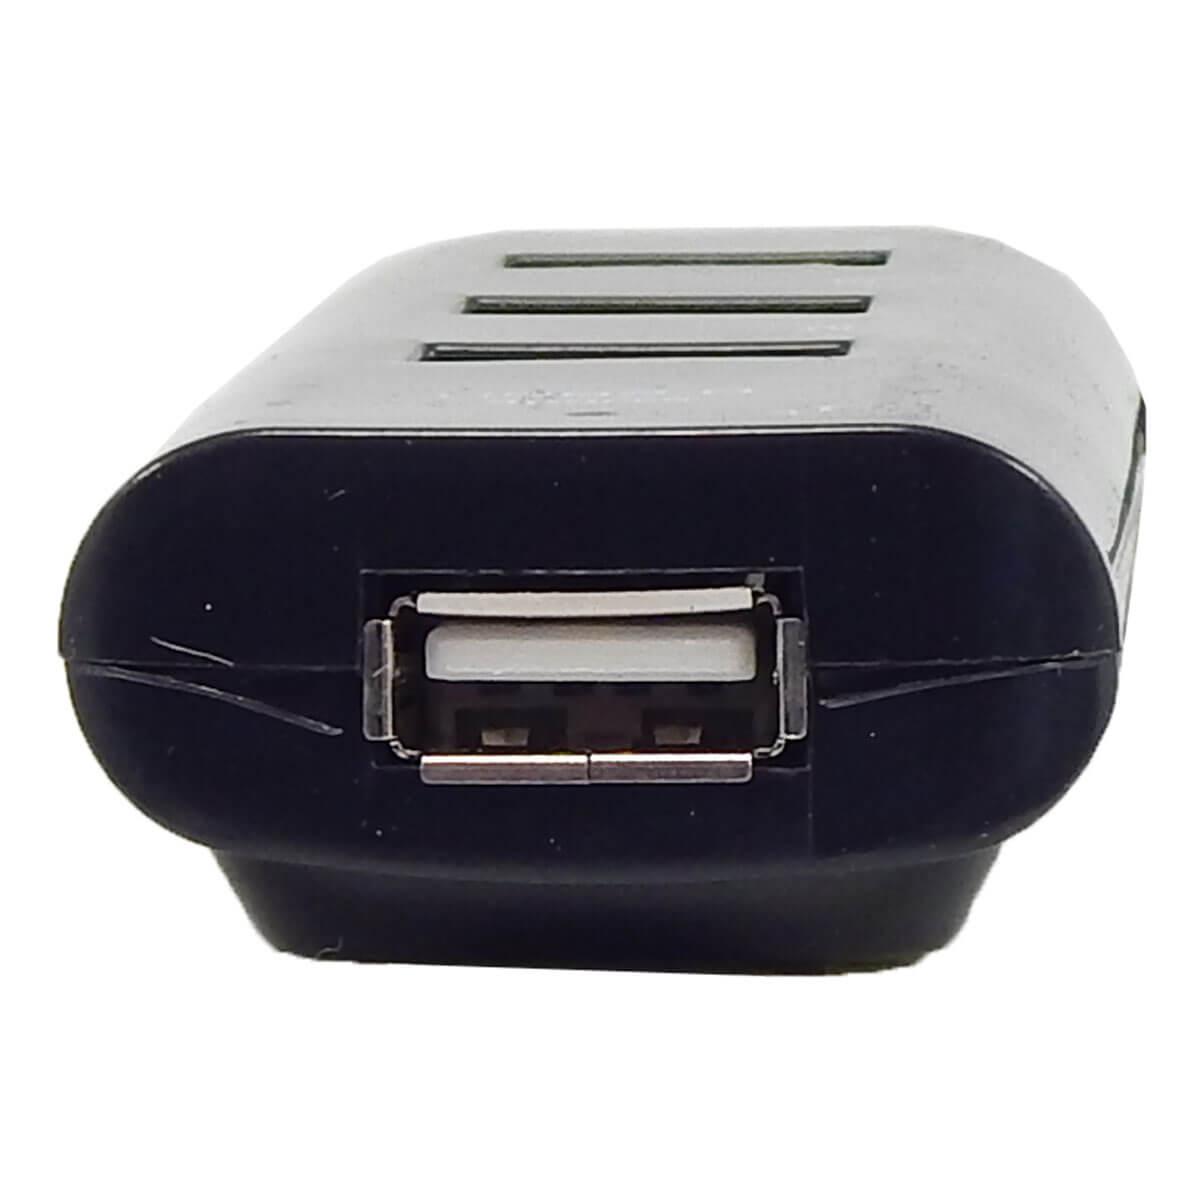 Hub USB 2.0 com 4 Portas